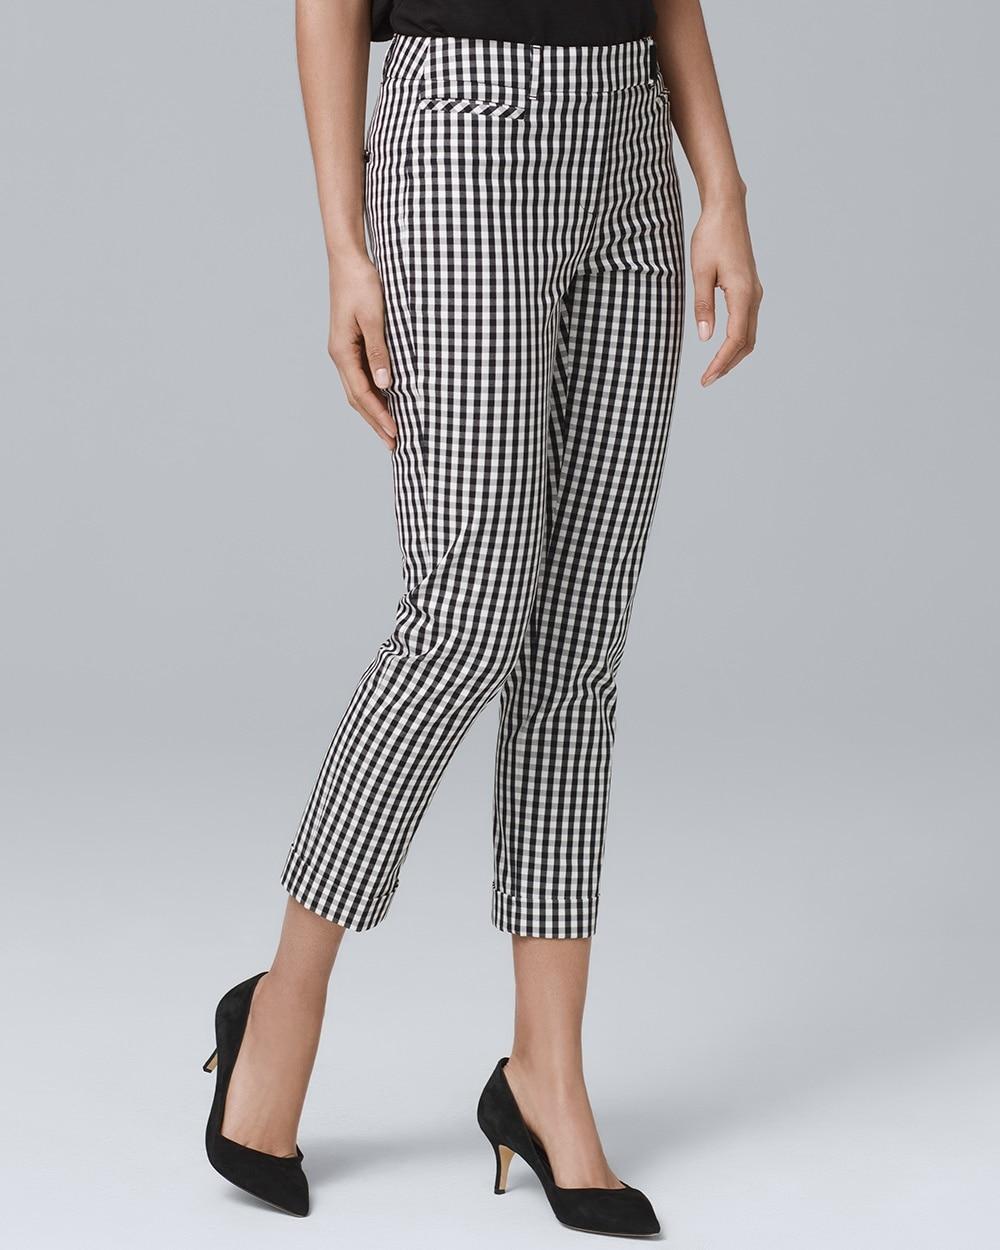 45558edb9bc32 Gingham Slim Crop Pants - White House Black Market